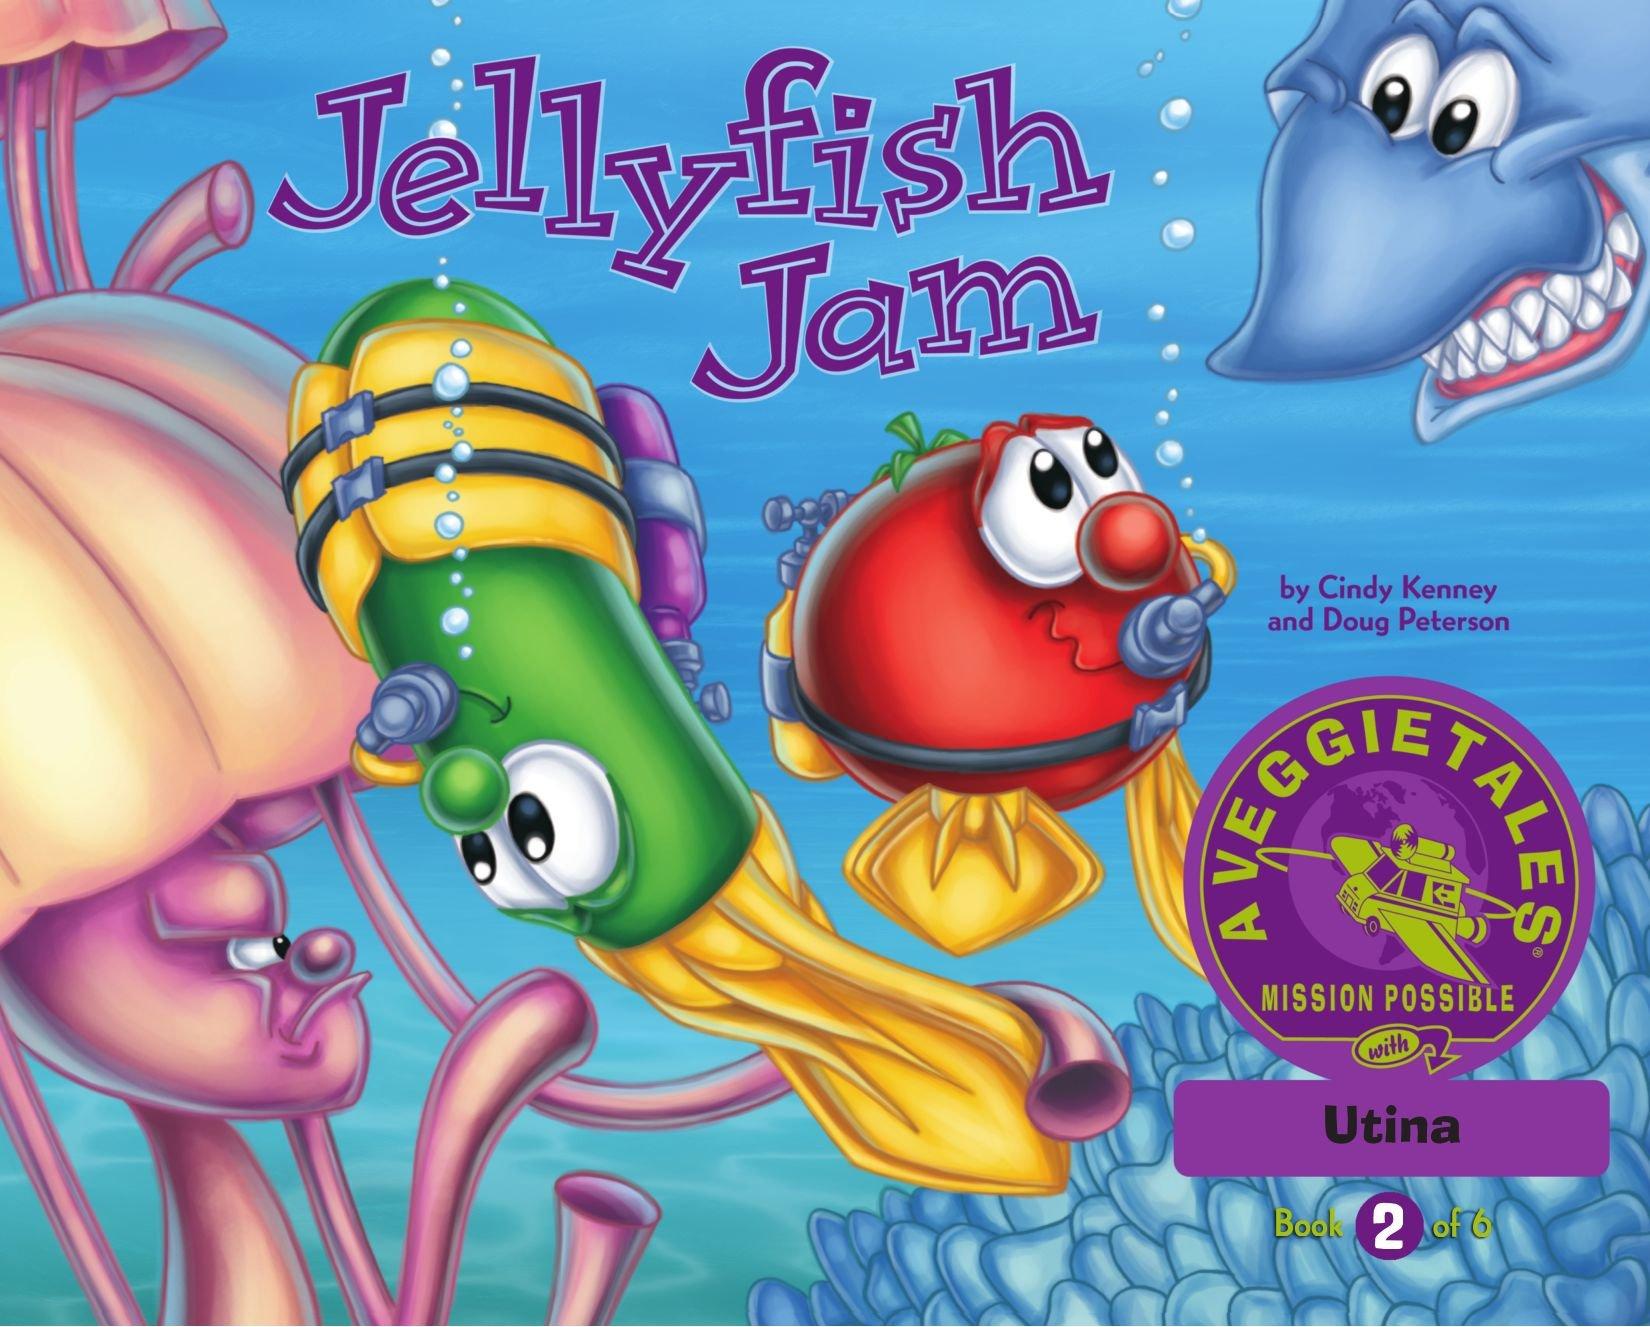 Download Jellyfish Jam - VeggieTales Mission Possible Adventure Series #2: Personalized for Utina (Boy) pdf epub